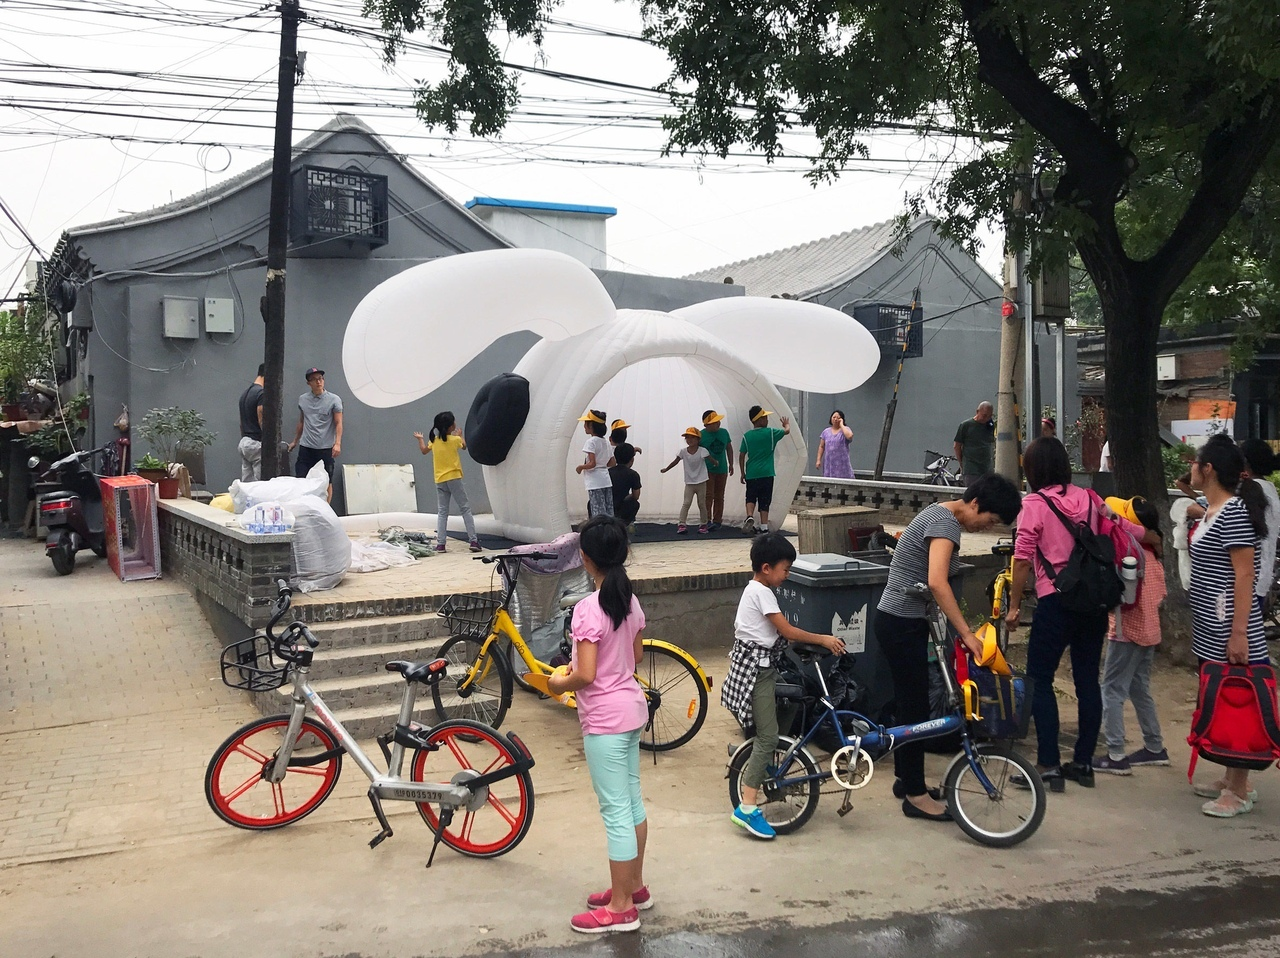 MAD creates inflatable pavilion shaped like a rabbit's head